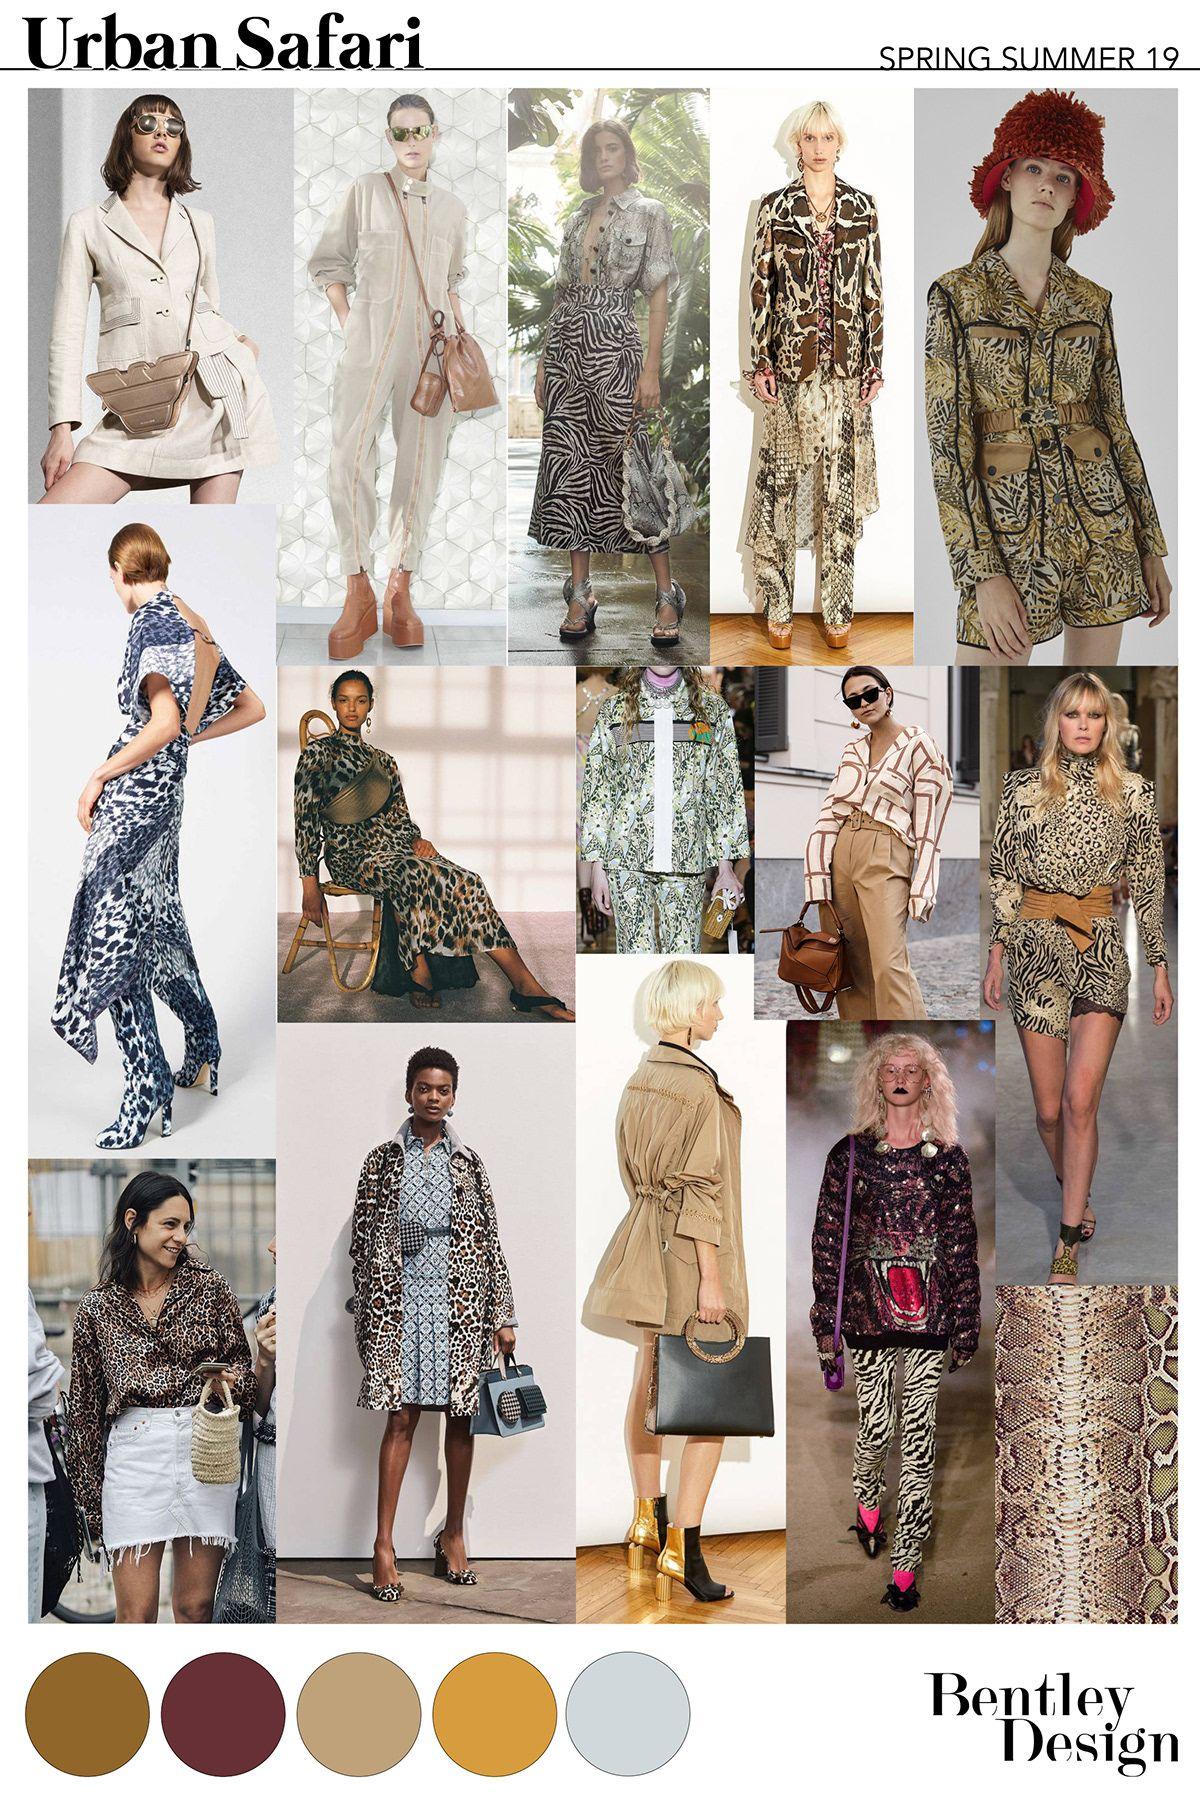 Freelance Fashion Designer - SS19 URBAN SAFARI | Trends ...